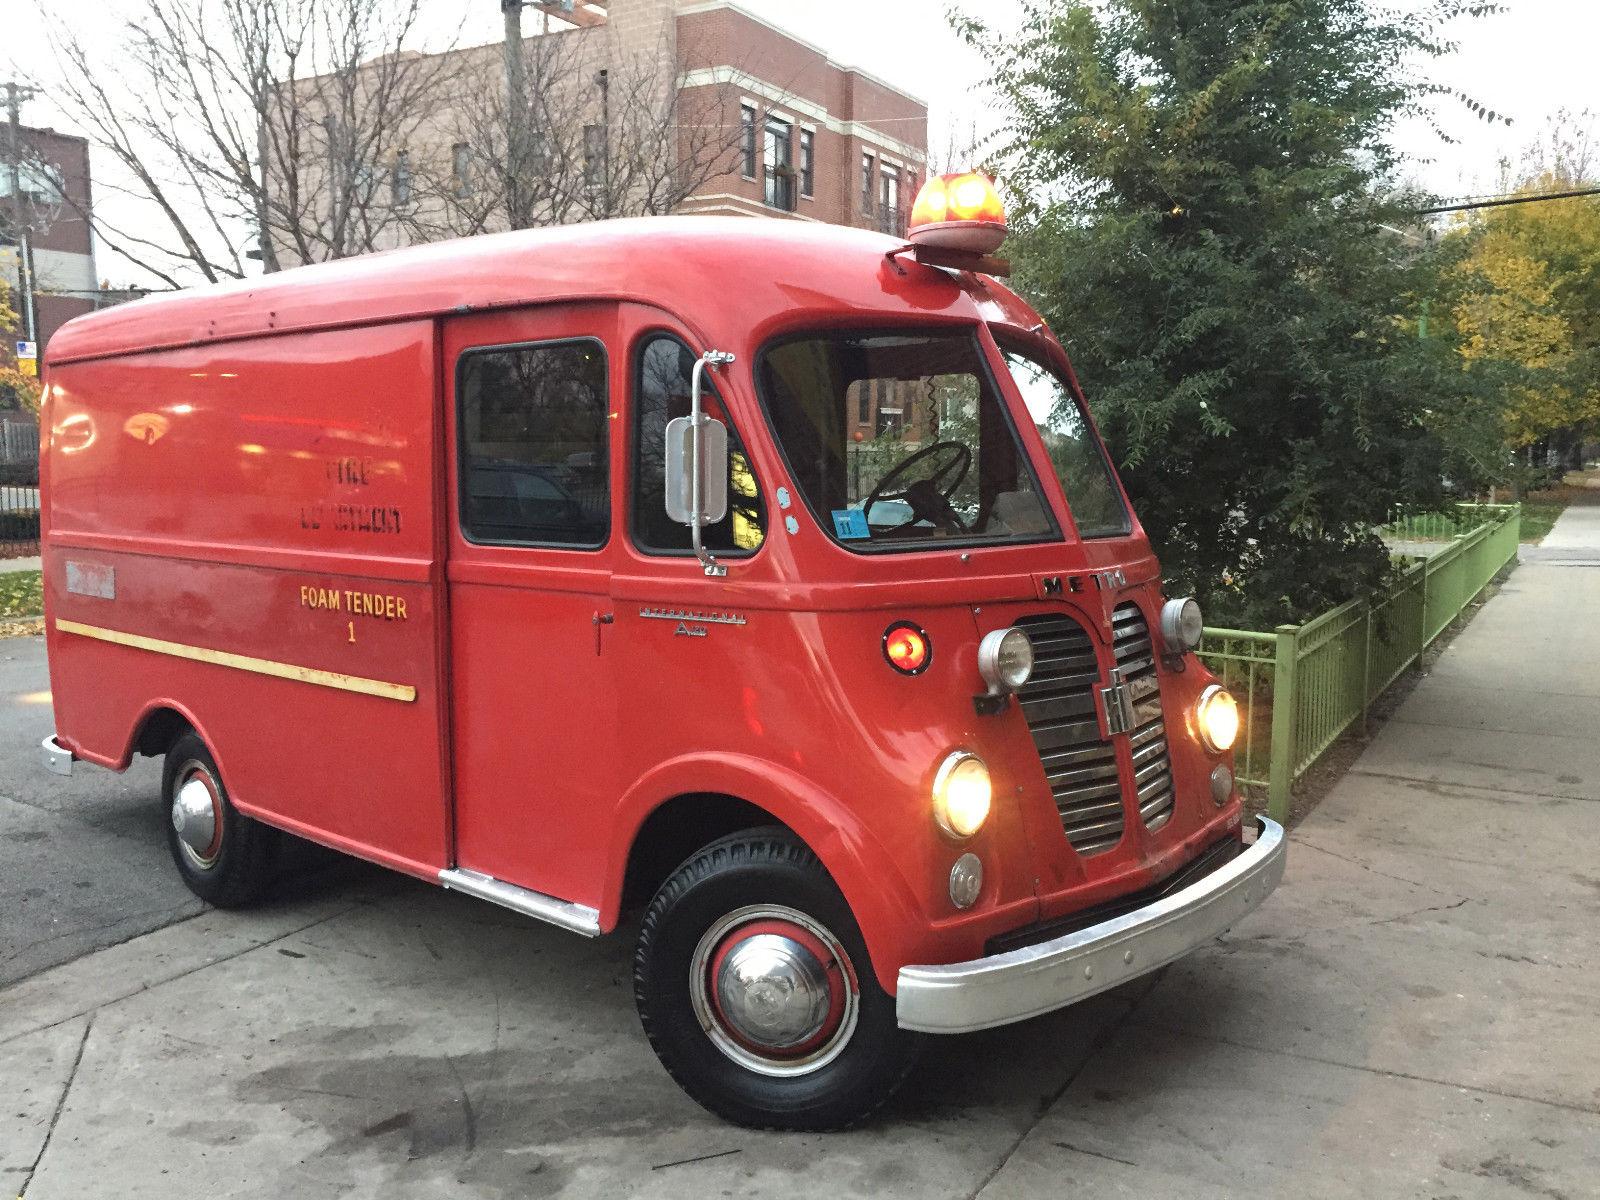 e72ba00398 1961 International Harvester Metro - A-120 Step Van - Fire Truck - Rare!